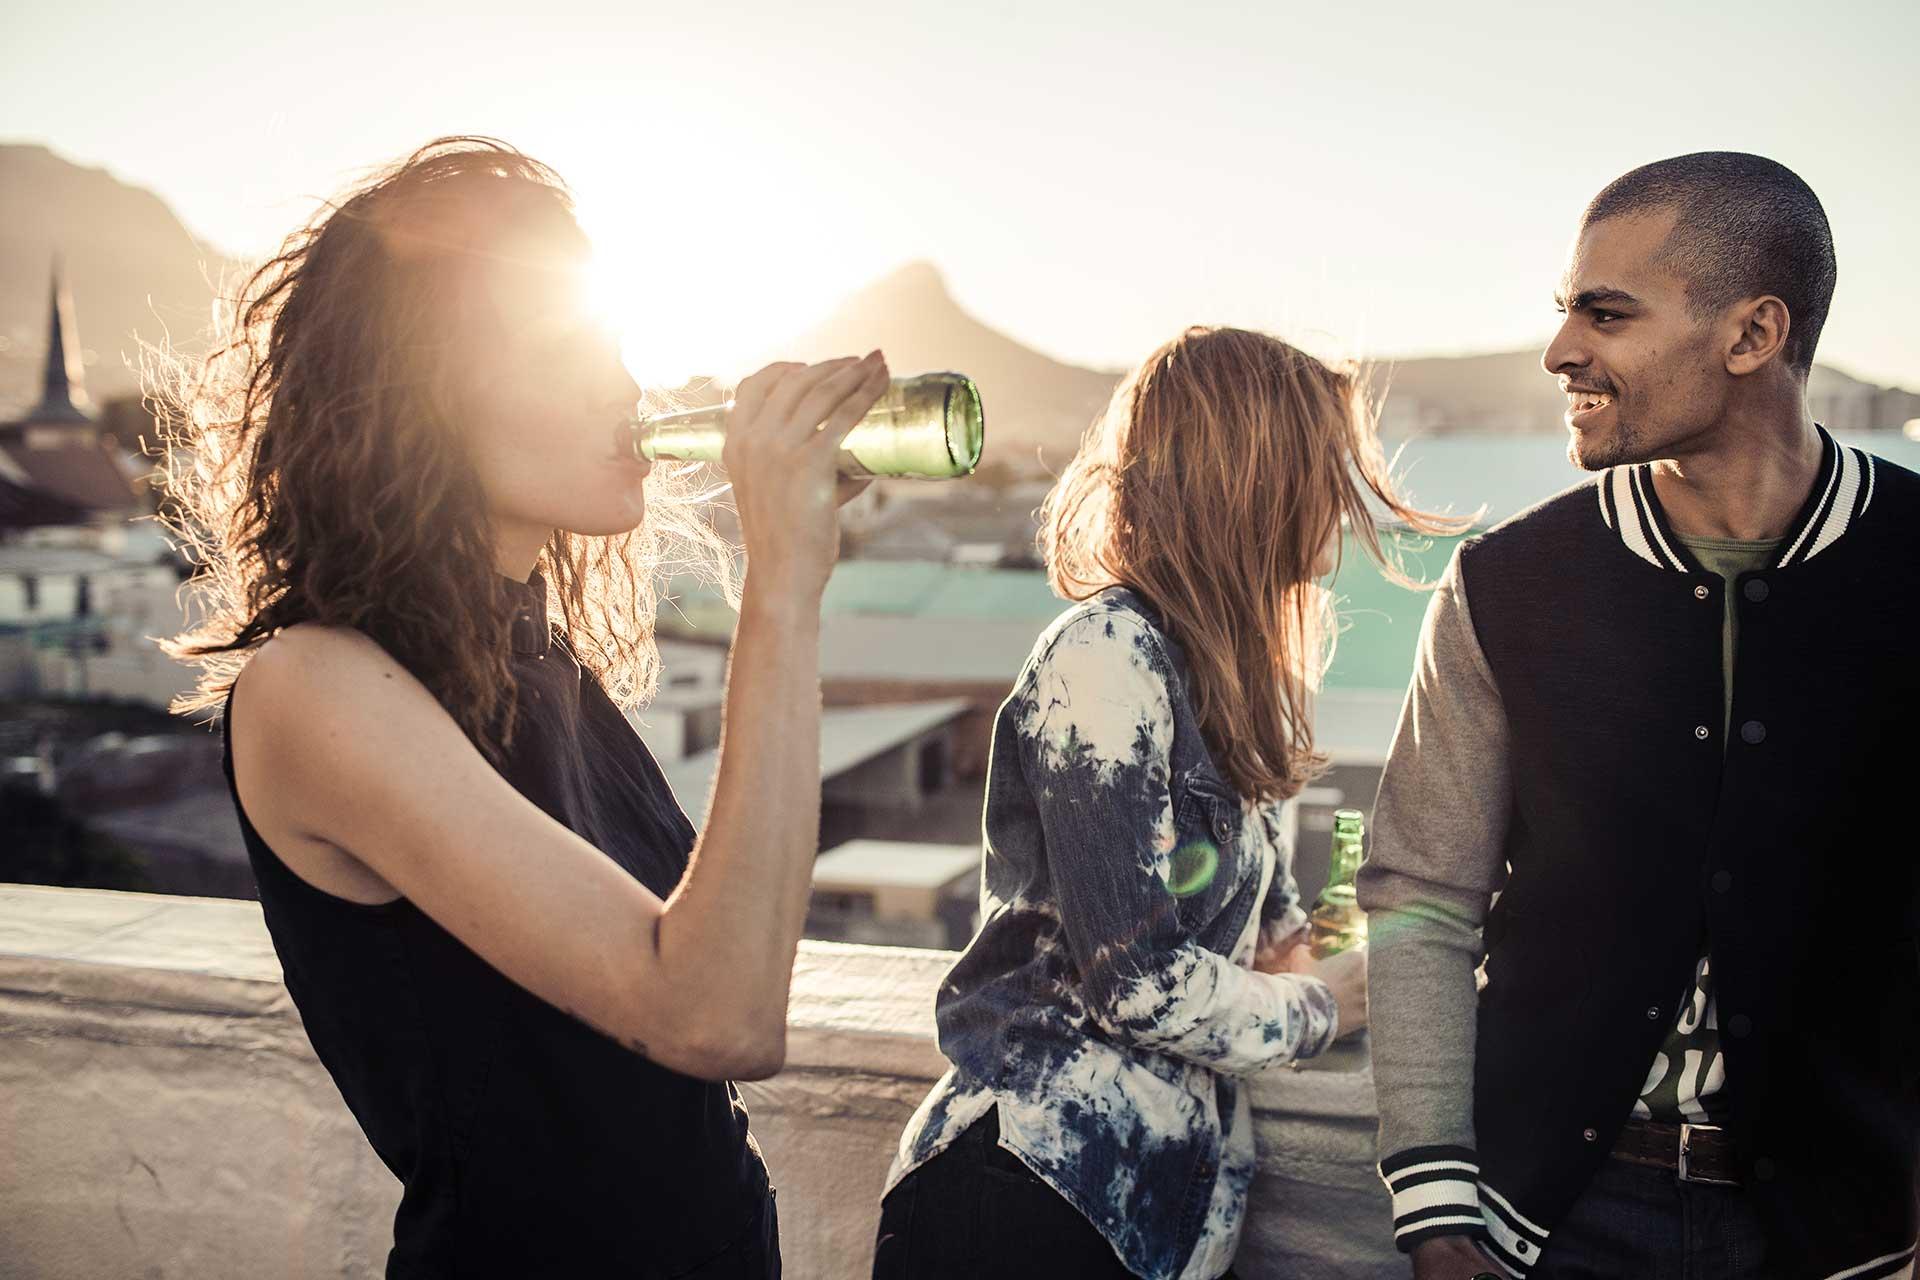 Bier Werbung Fotoproduktion Lifestyle People Kapstadt Rooftop